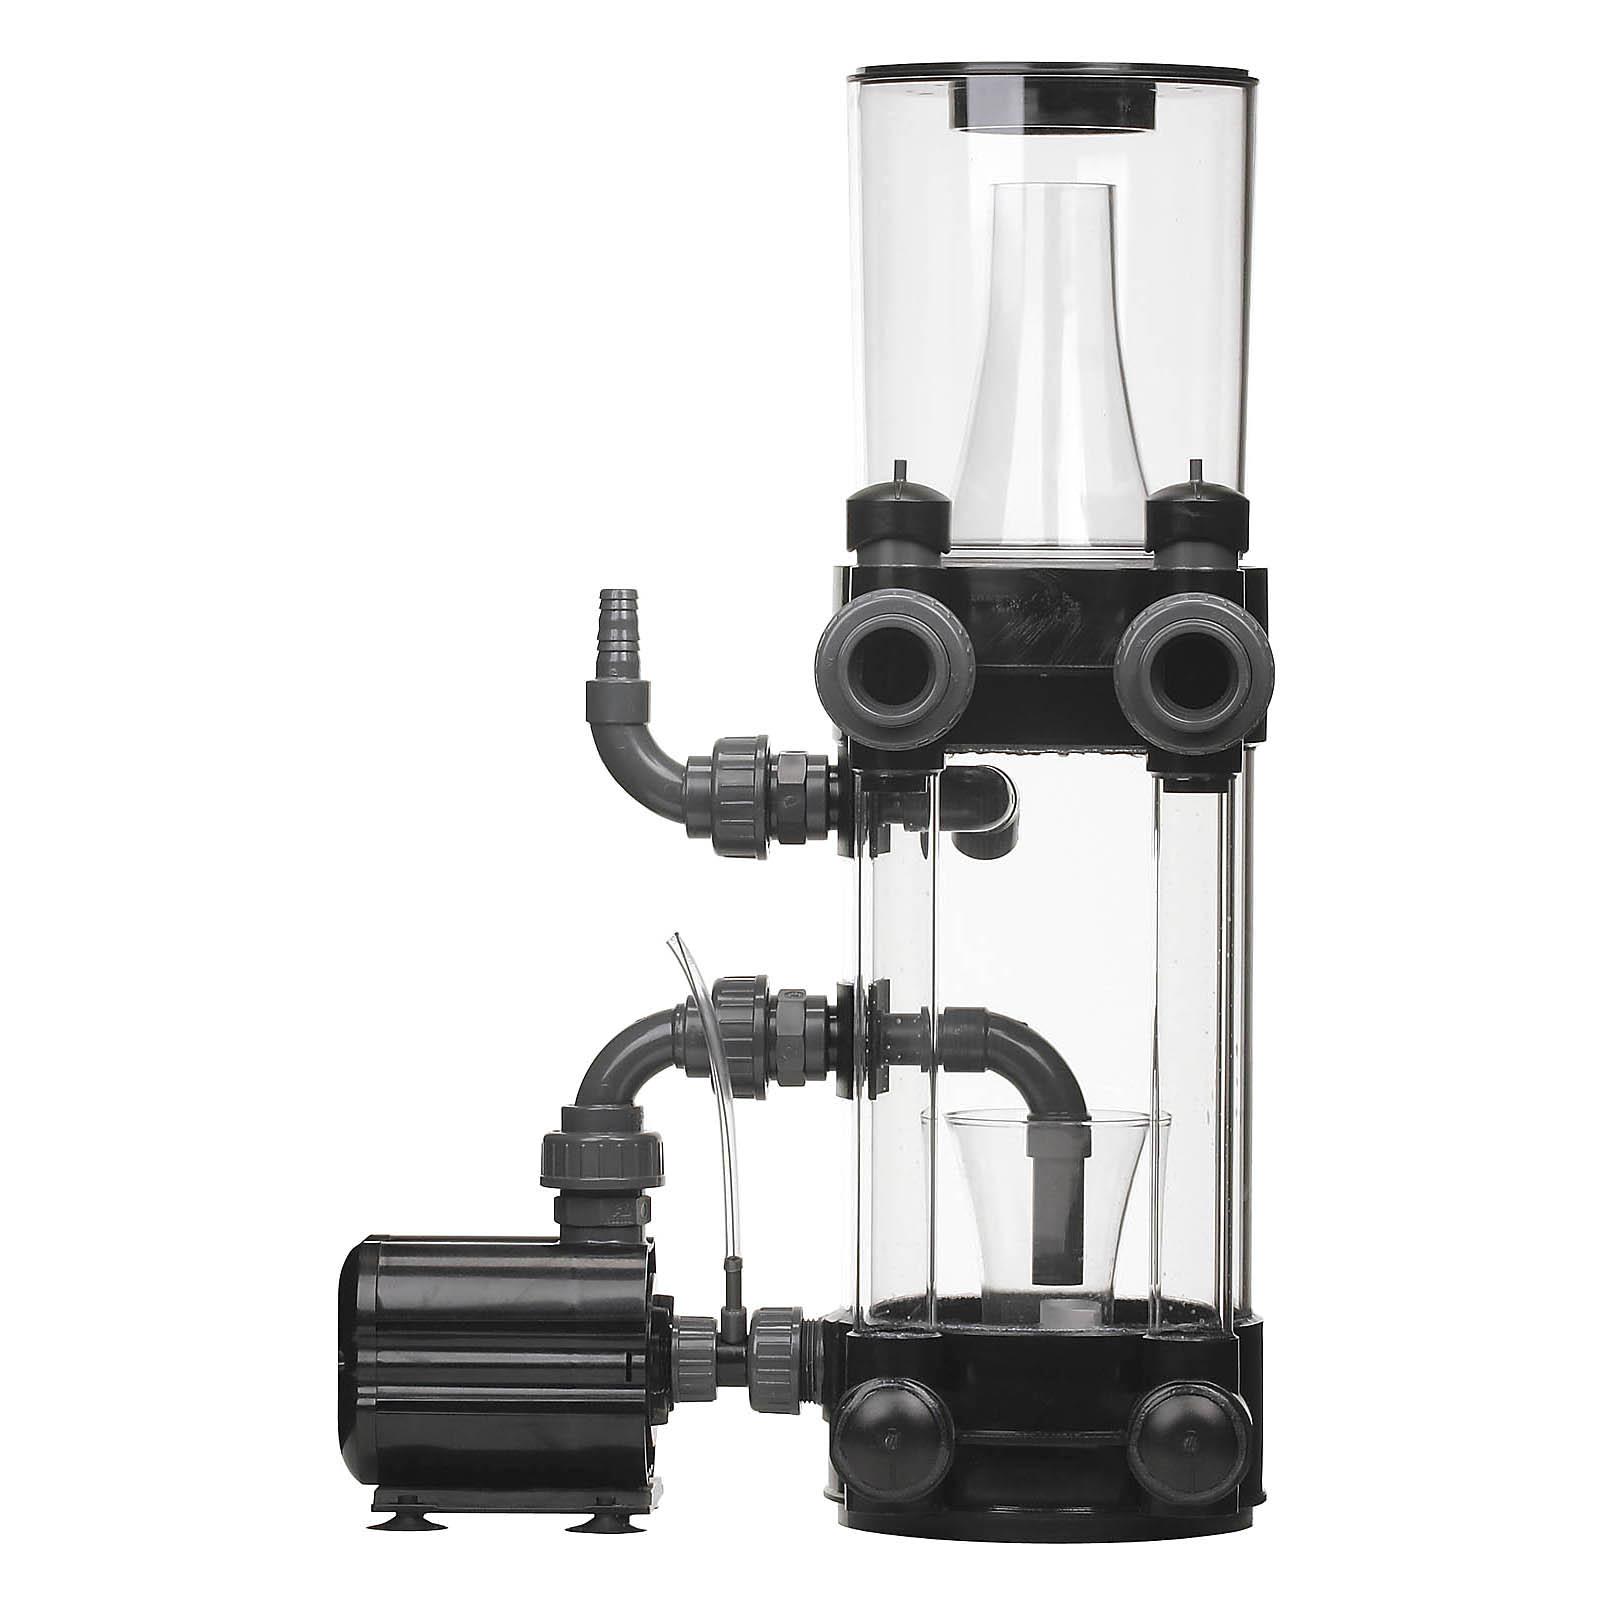 AQUA MEDIC Turboflotor 5000 Shorty II écumeur externe pour aquarium jusqu\'à 1500 L